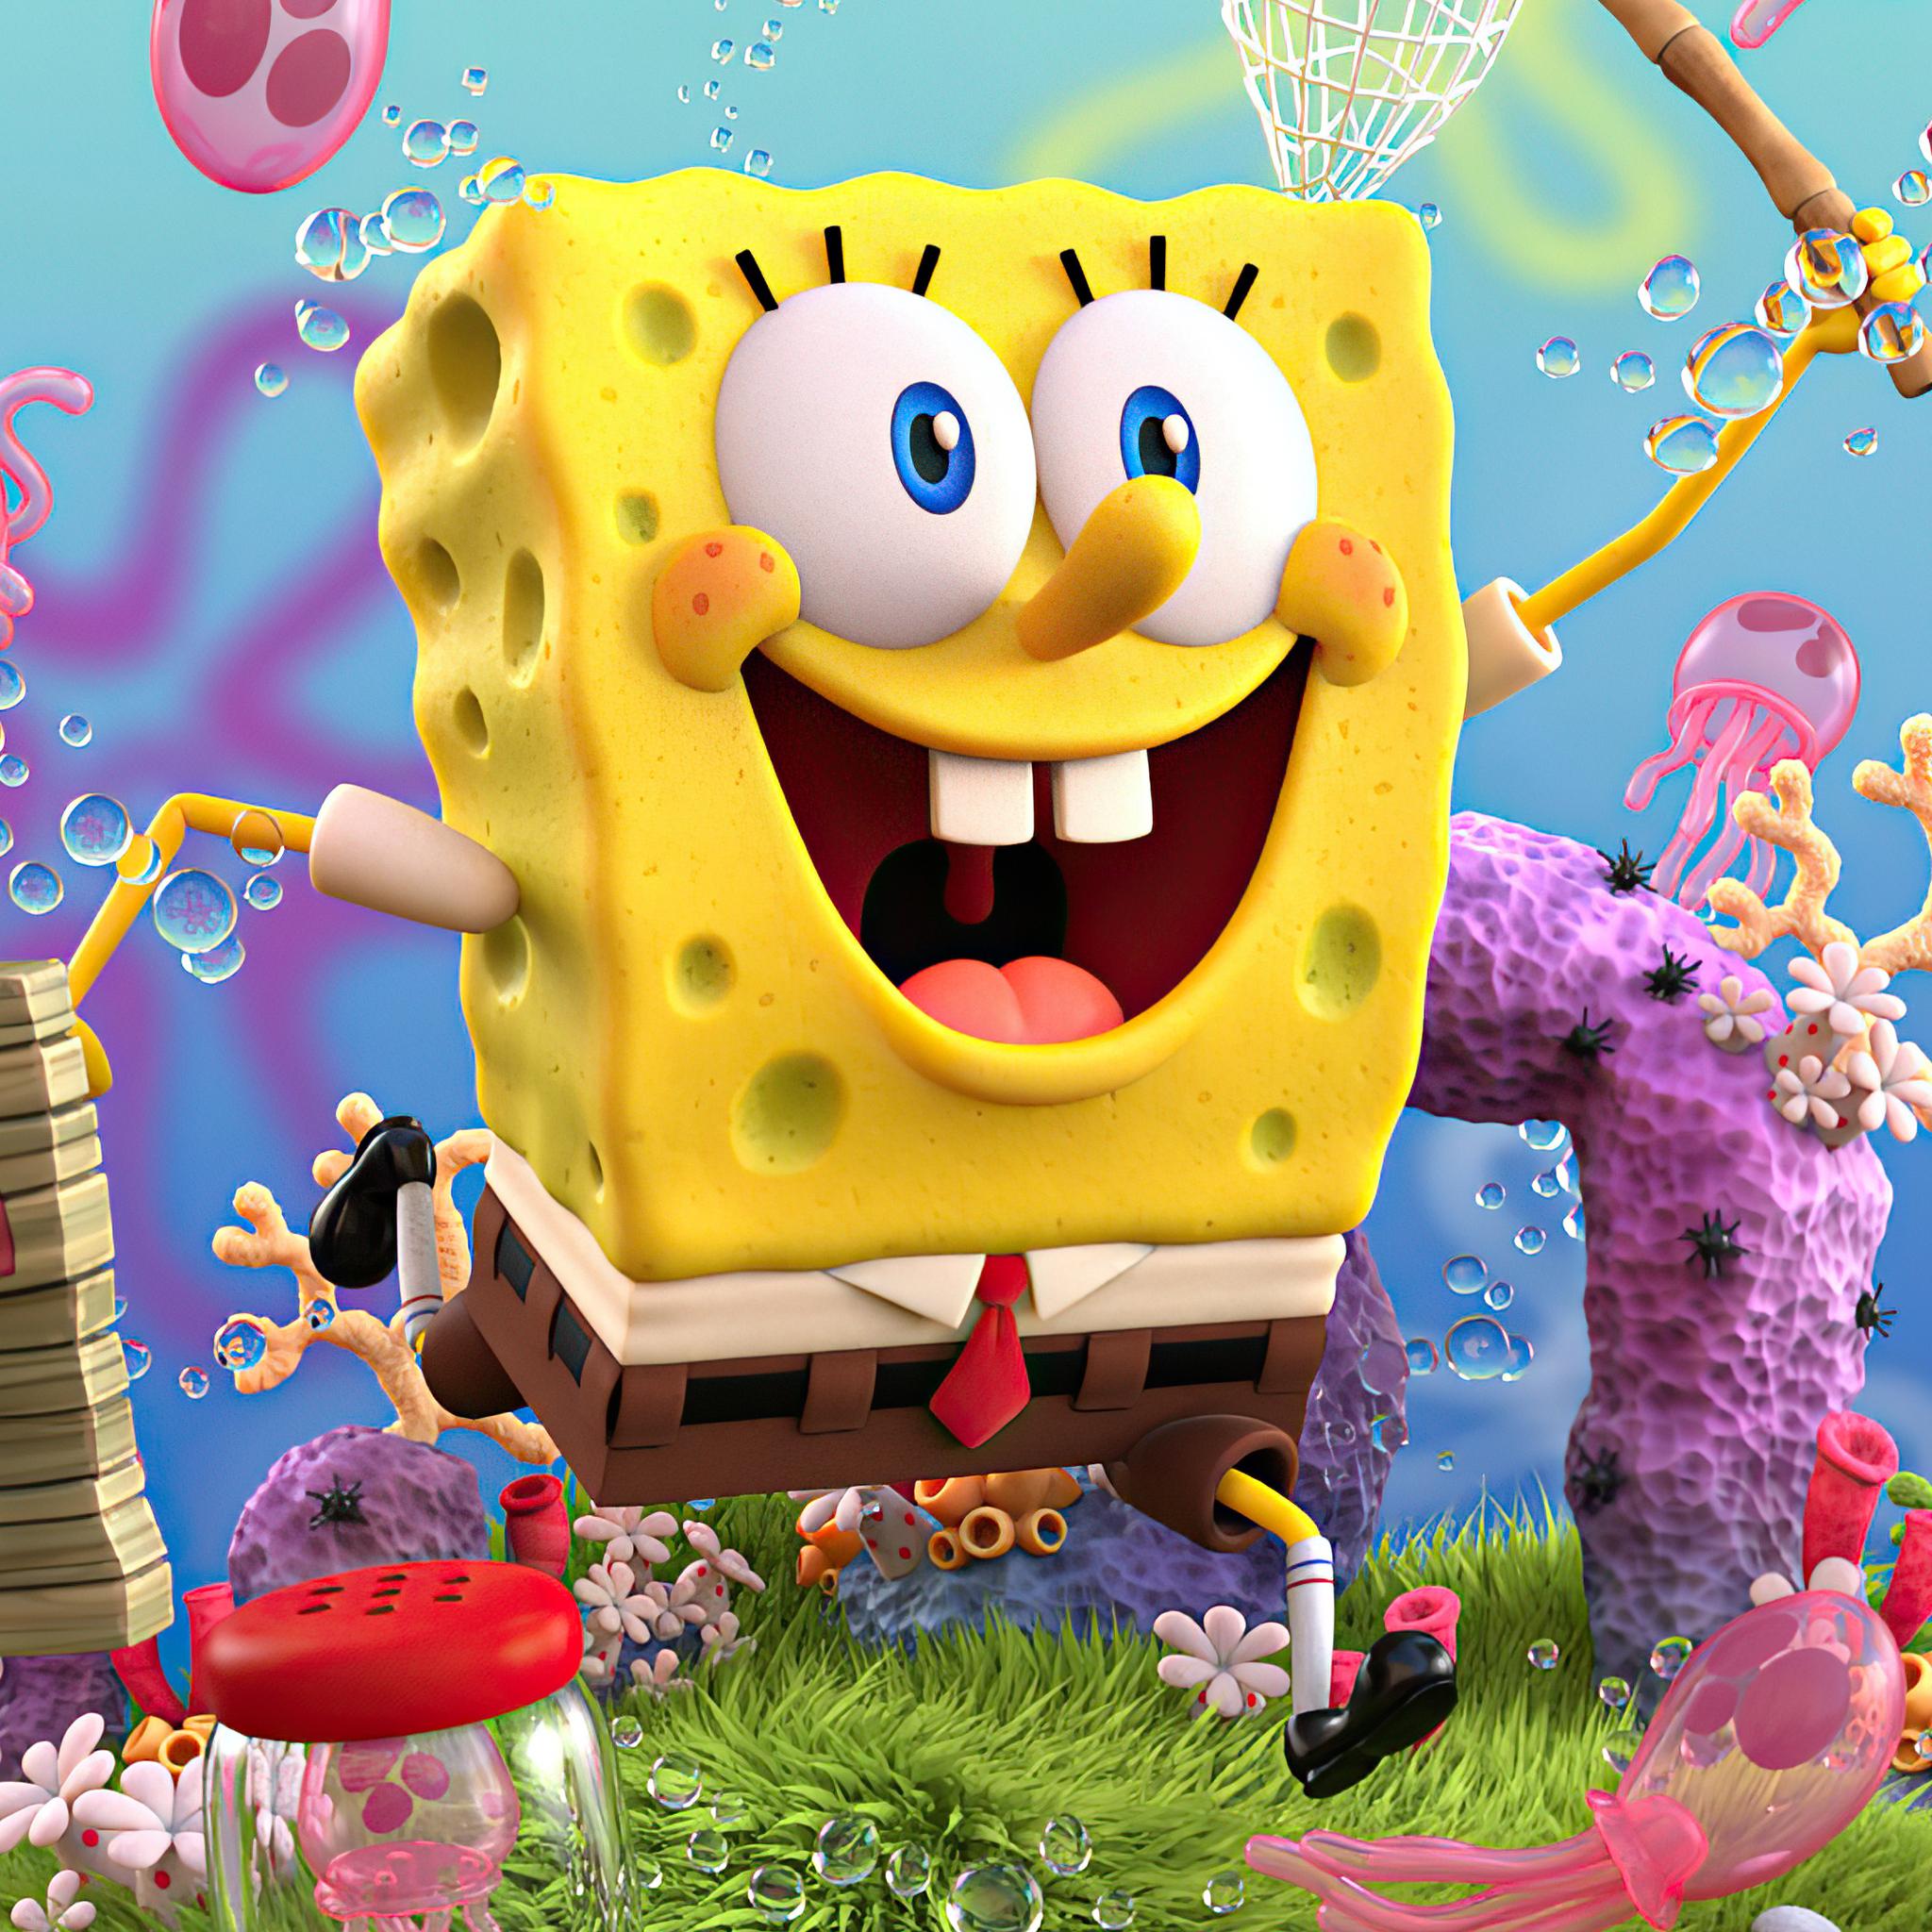 2048x2048 SpongeBob SquarePants 4k 2020 Ipad Air HD 4k ...